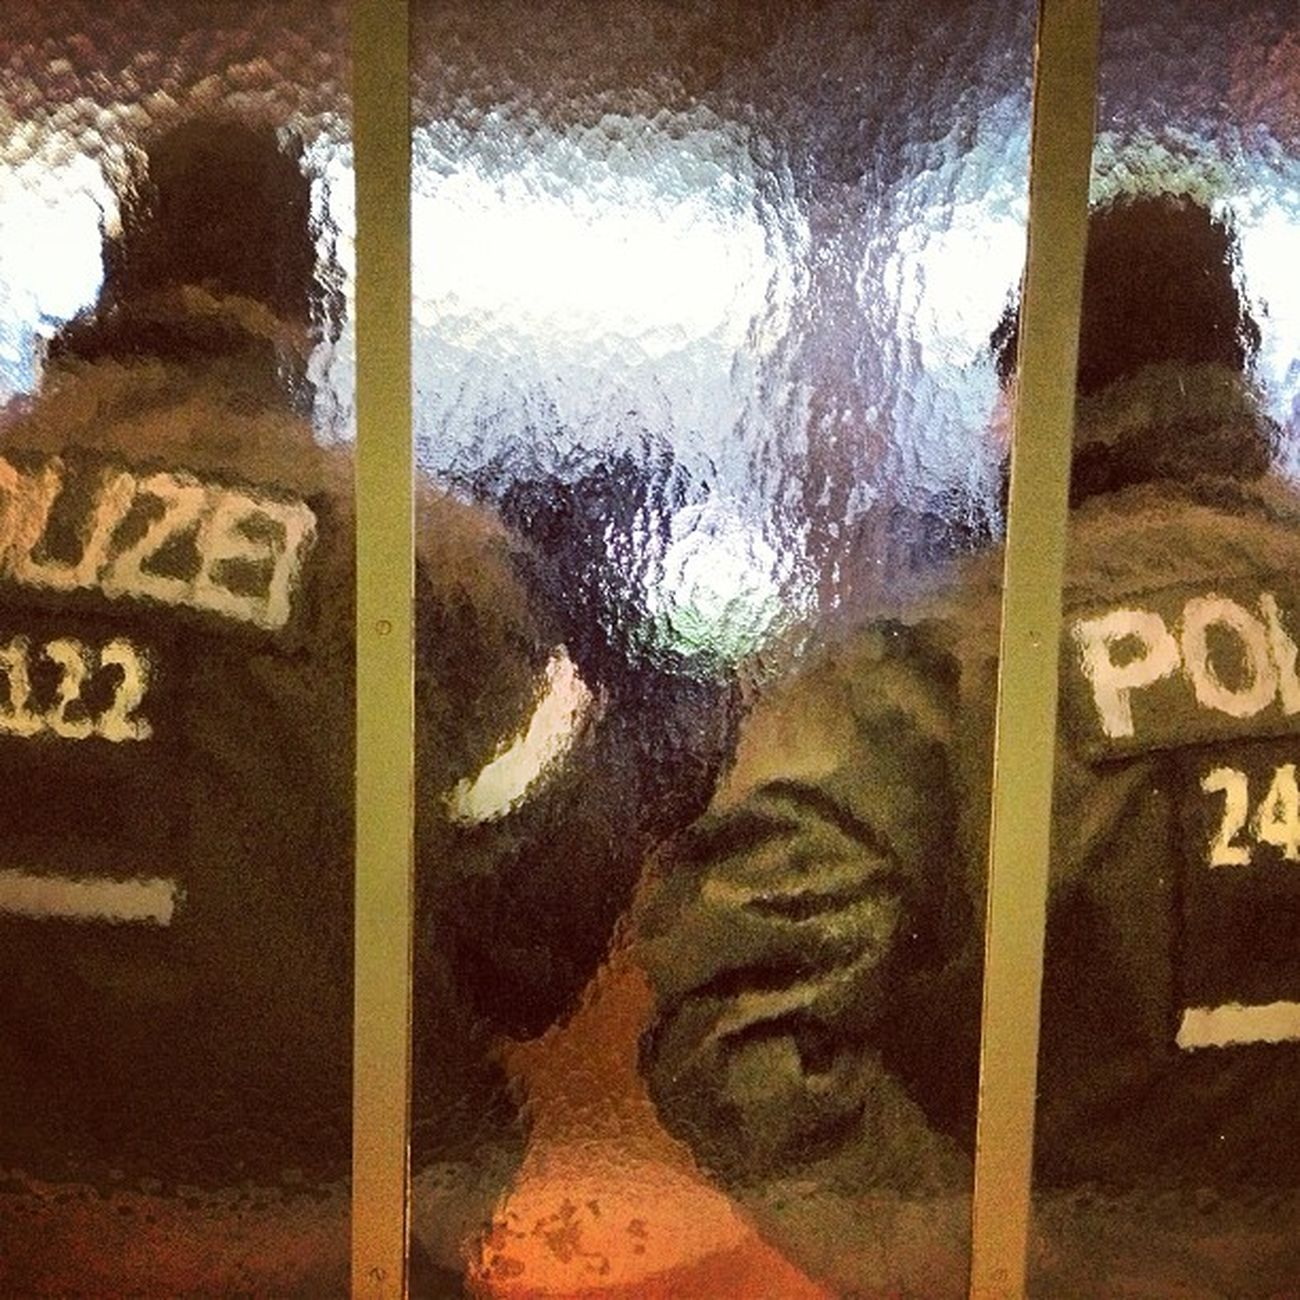 #igersberlin #instagood #tweegram #photooftheday #follow #instamod #igers #picoftheday #instragamhub #instadaily #insta_germany #bestoftheday #igdaily #websteagam #instragramers #ig_special #igersberlin #gf_germany #all_shots #berlin #germany #police #pol Bestoftheday Igers IGDaily Tweegram Instagood Instadaily Igersberlin Insta_germany Berlin Gf_germany Germany Instragramers Police Ig_special Polizei Instragamhub Photooftheday Instamod Picoftheday Websteagam Follow All_shots